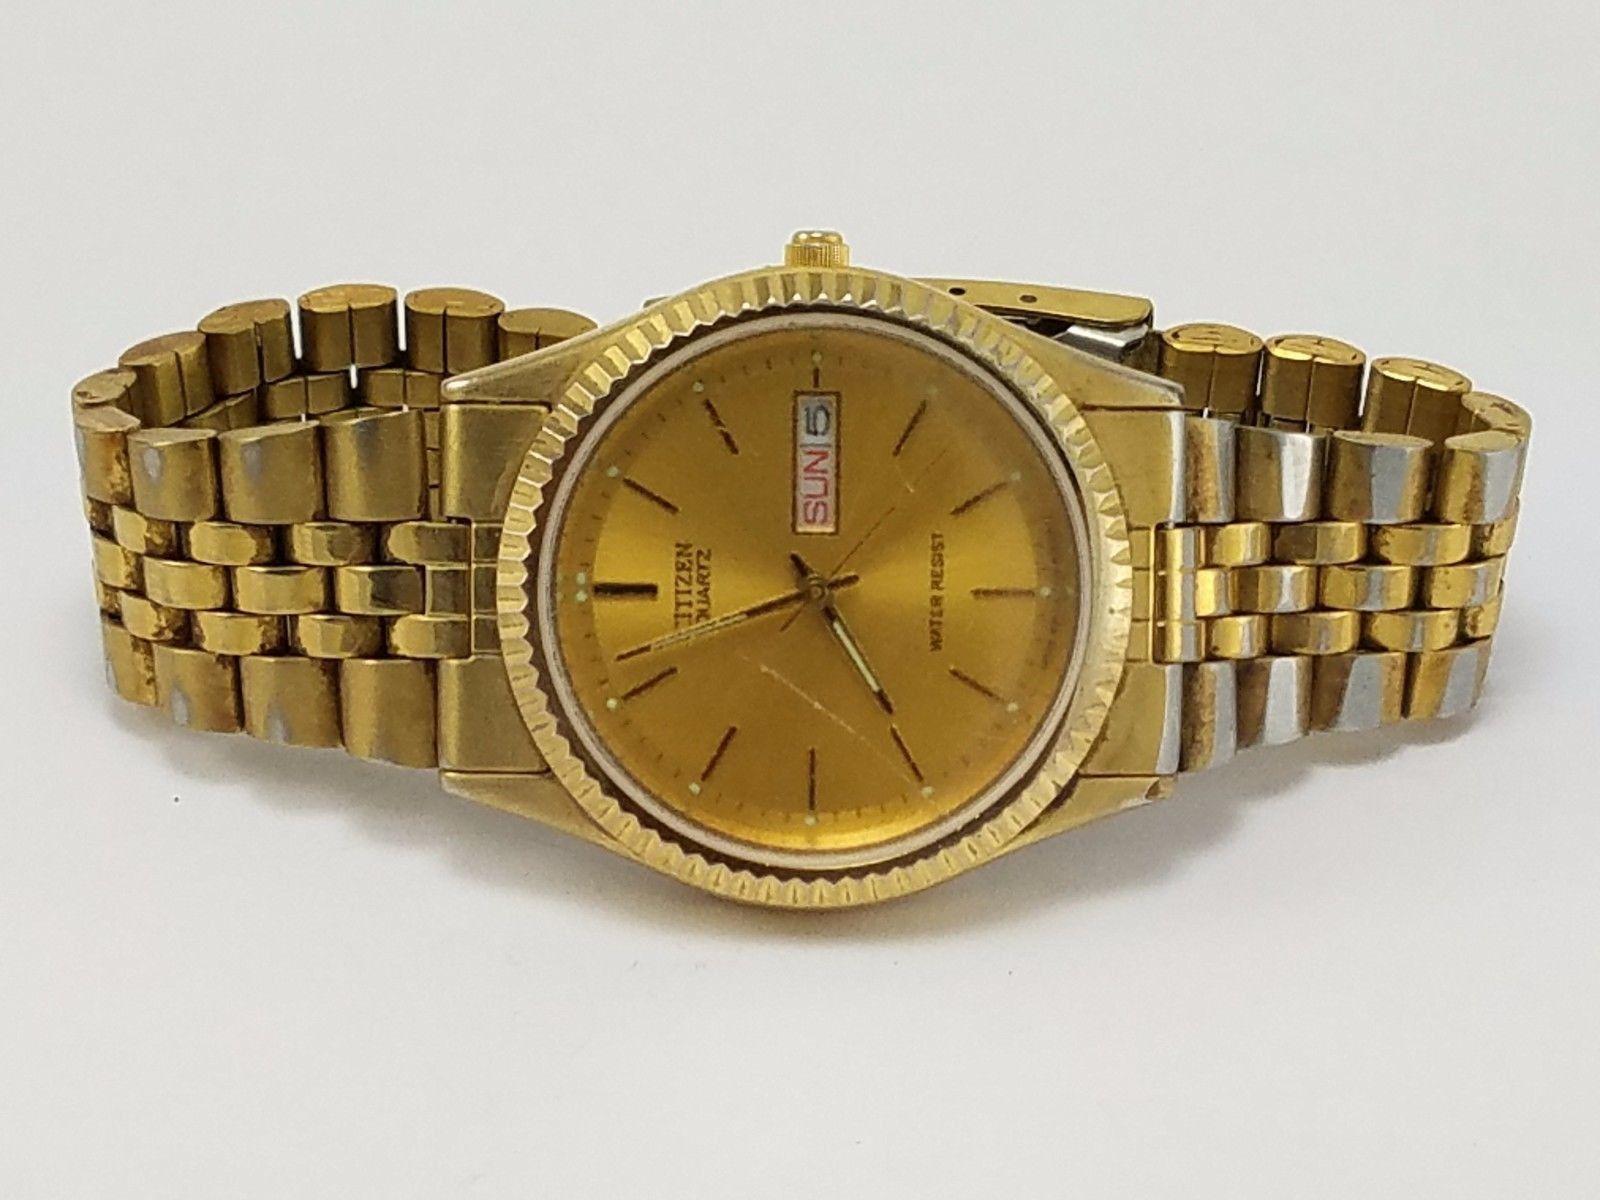 citizen watch co 6100 rc vintage gold toned mens stainless steel citizen watch co 6100 rc vintage gold toned mens stainless steel day date